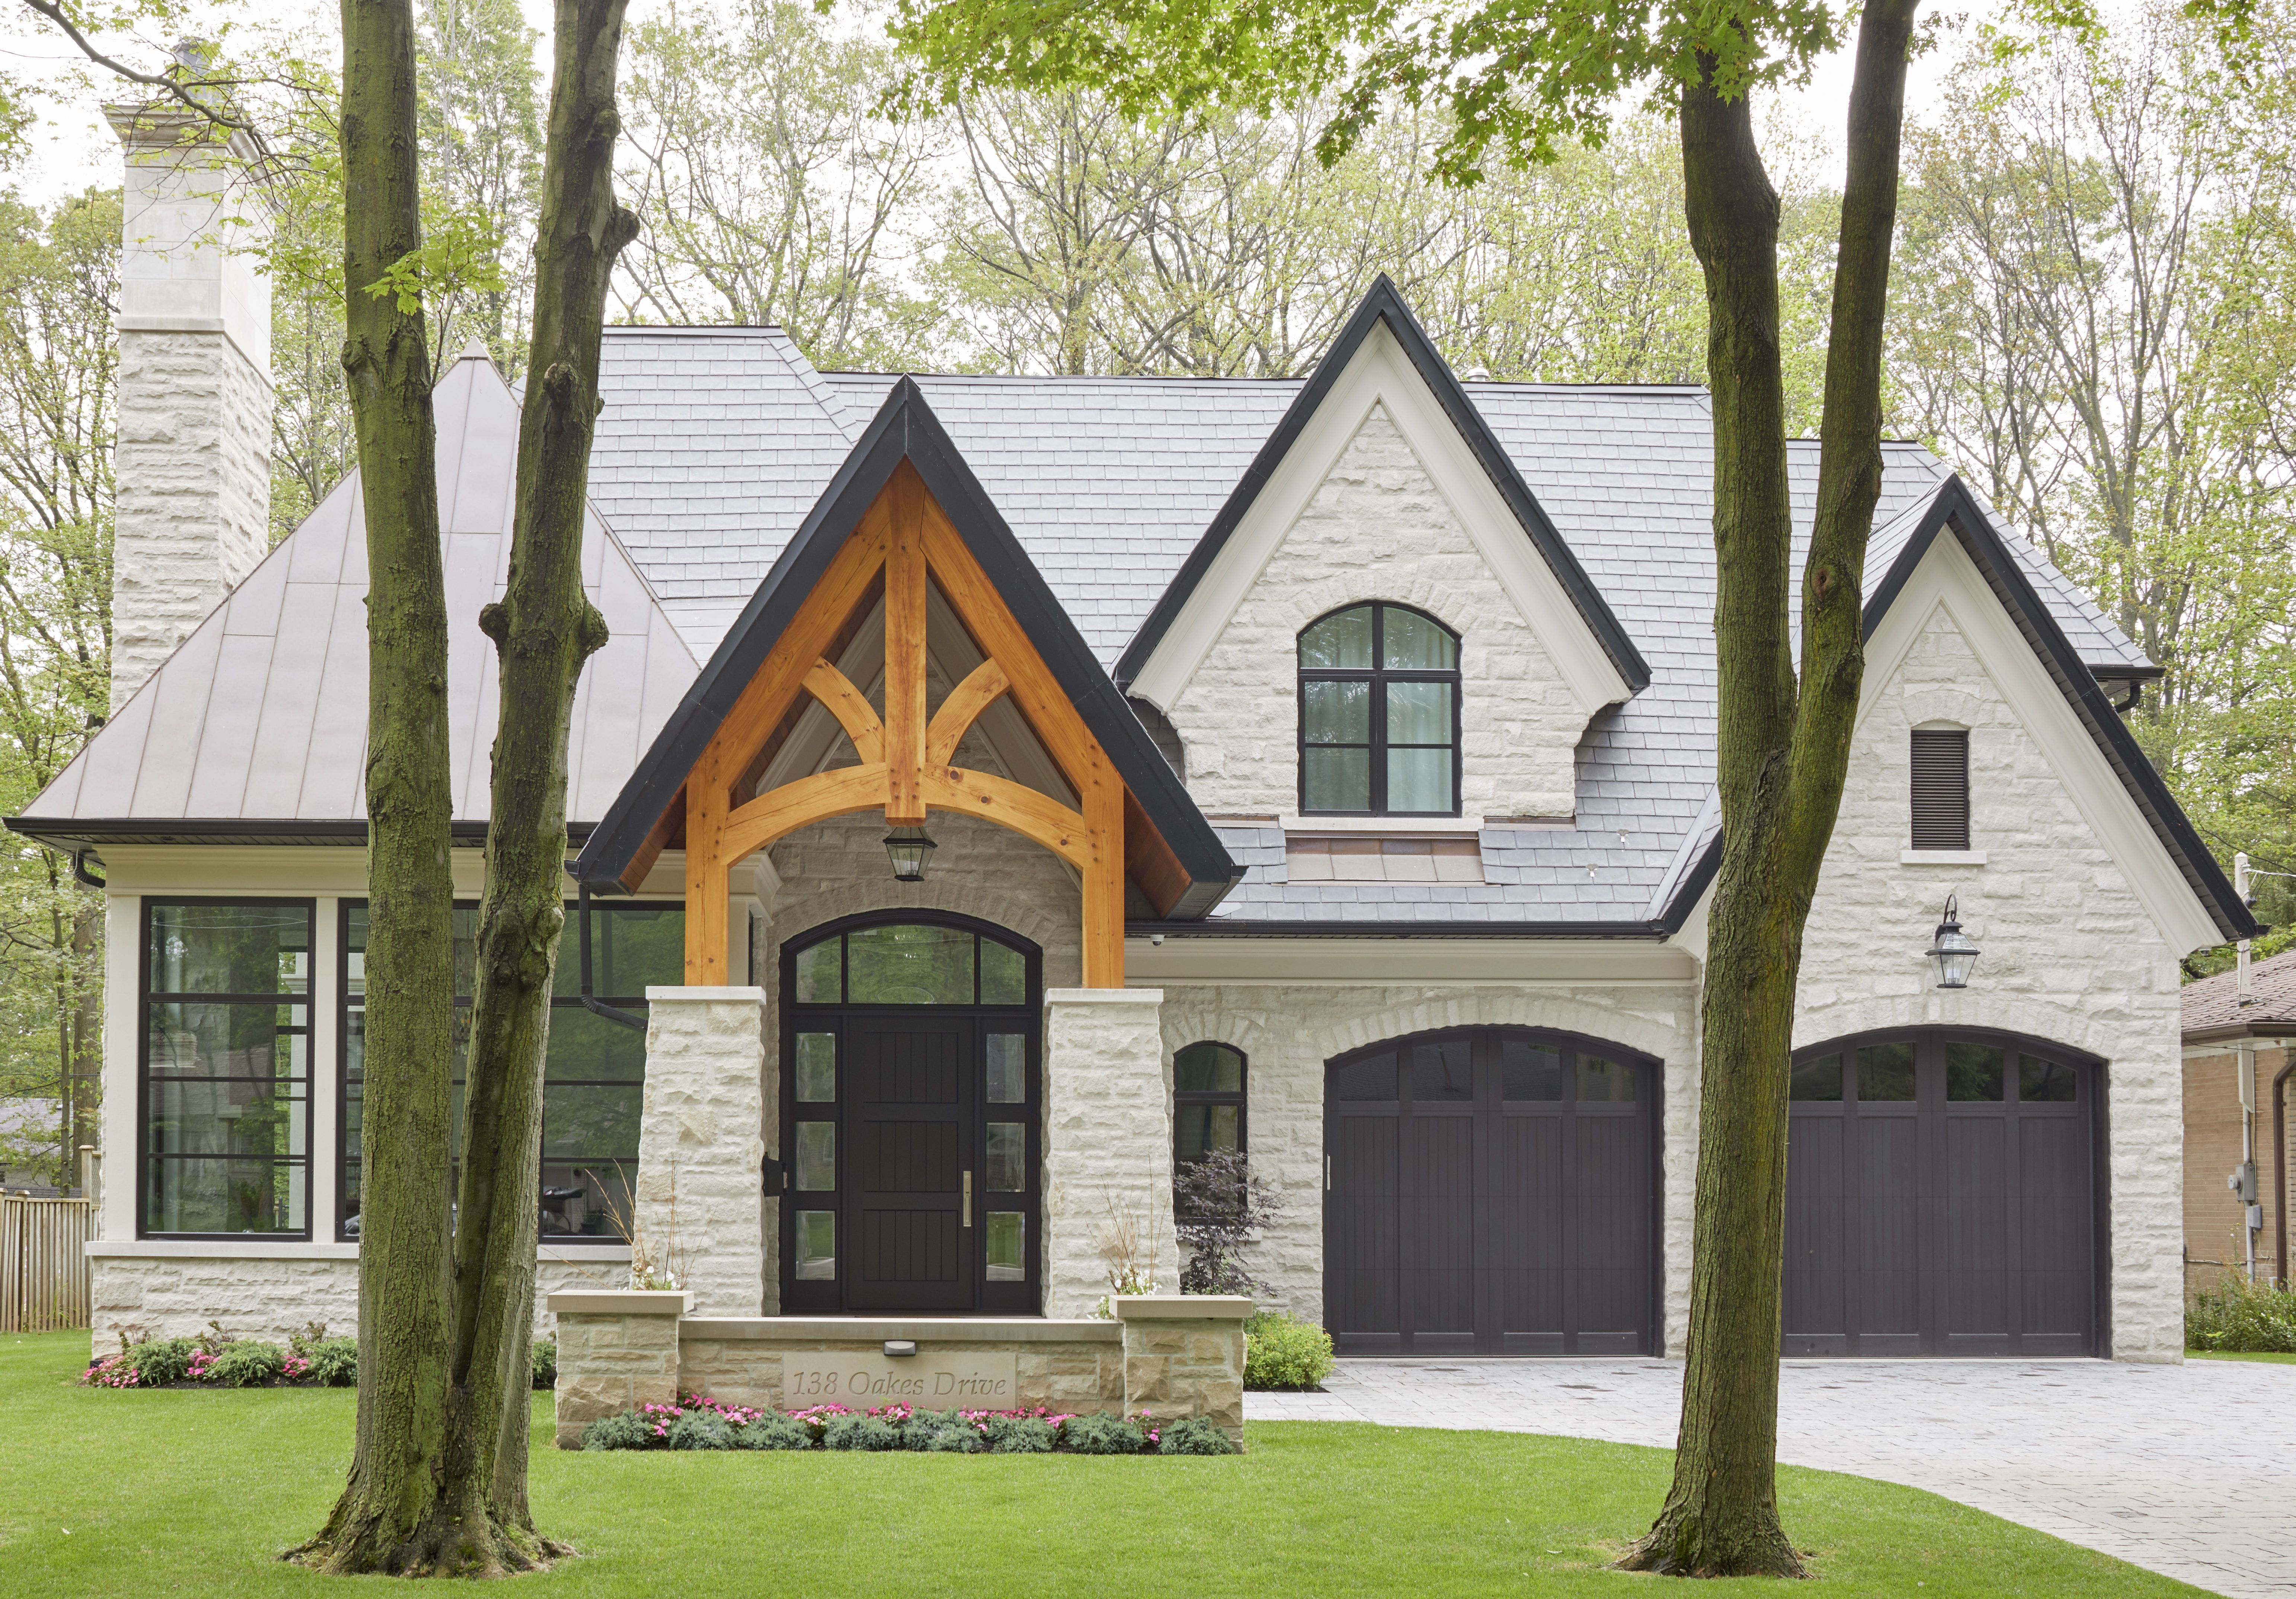 Home Exterior With Eifs Finish Ontario Canada Craftsman Home Exterior House Exterior House Designs Exterior